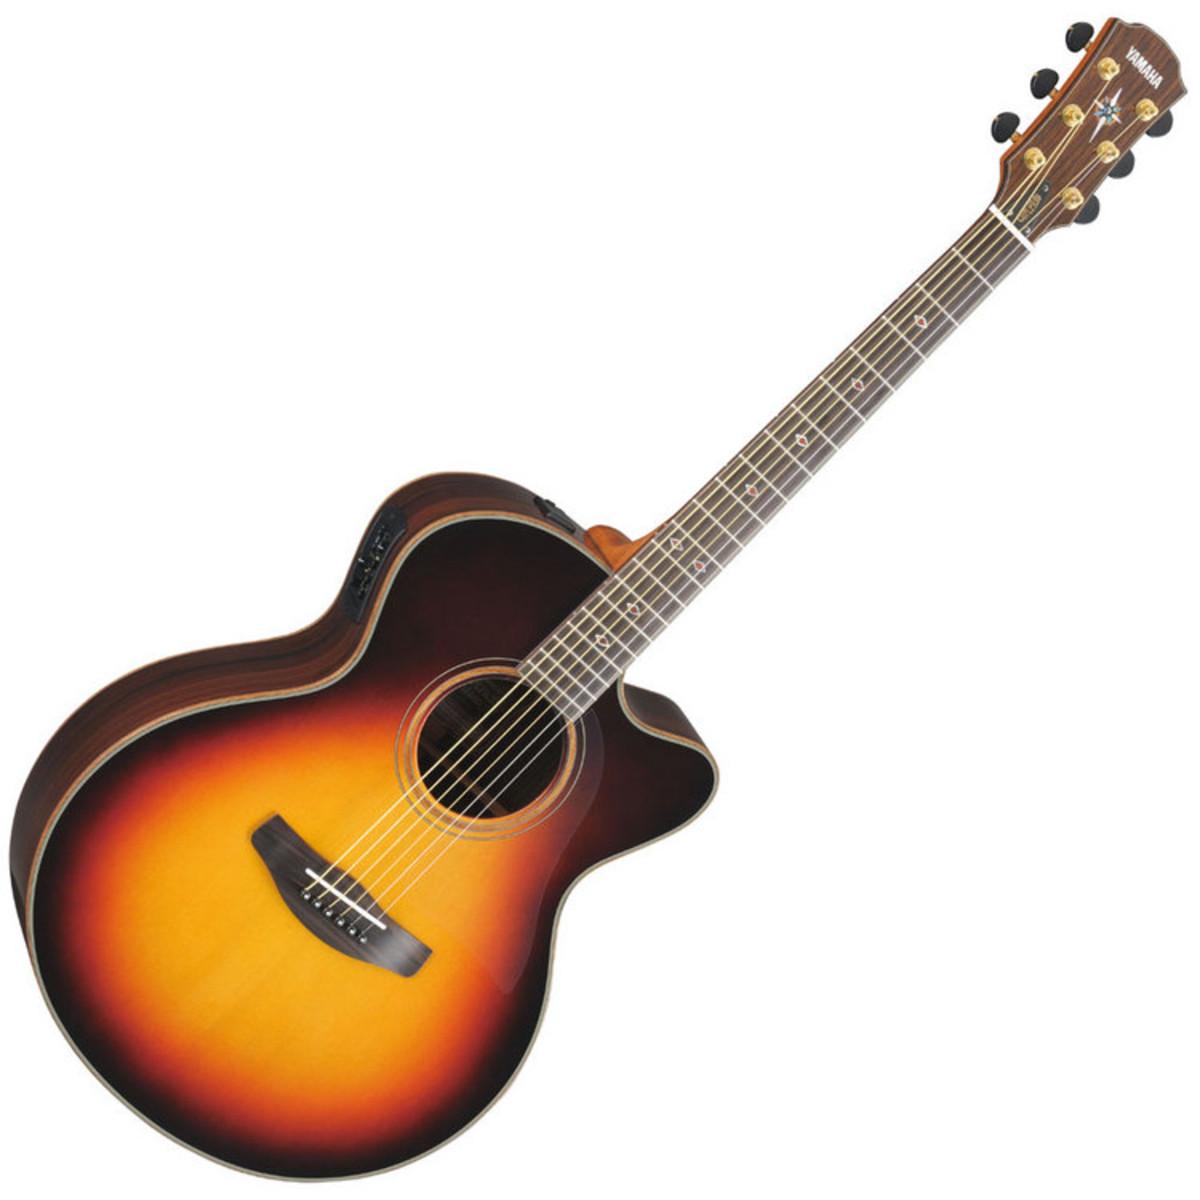 Yamaha cpx1200 electro acoustic guitar vintage sunburst for Where are yamaha guitars made